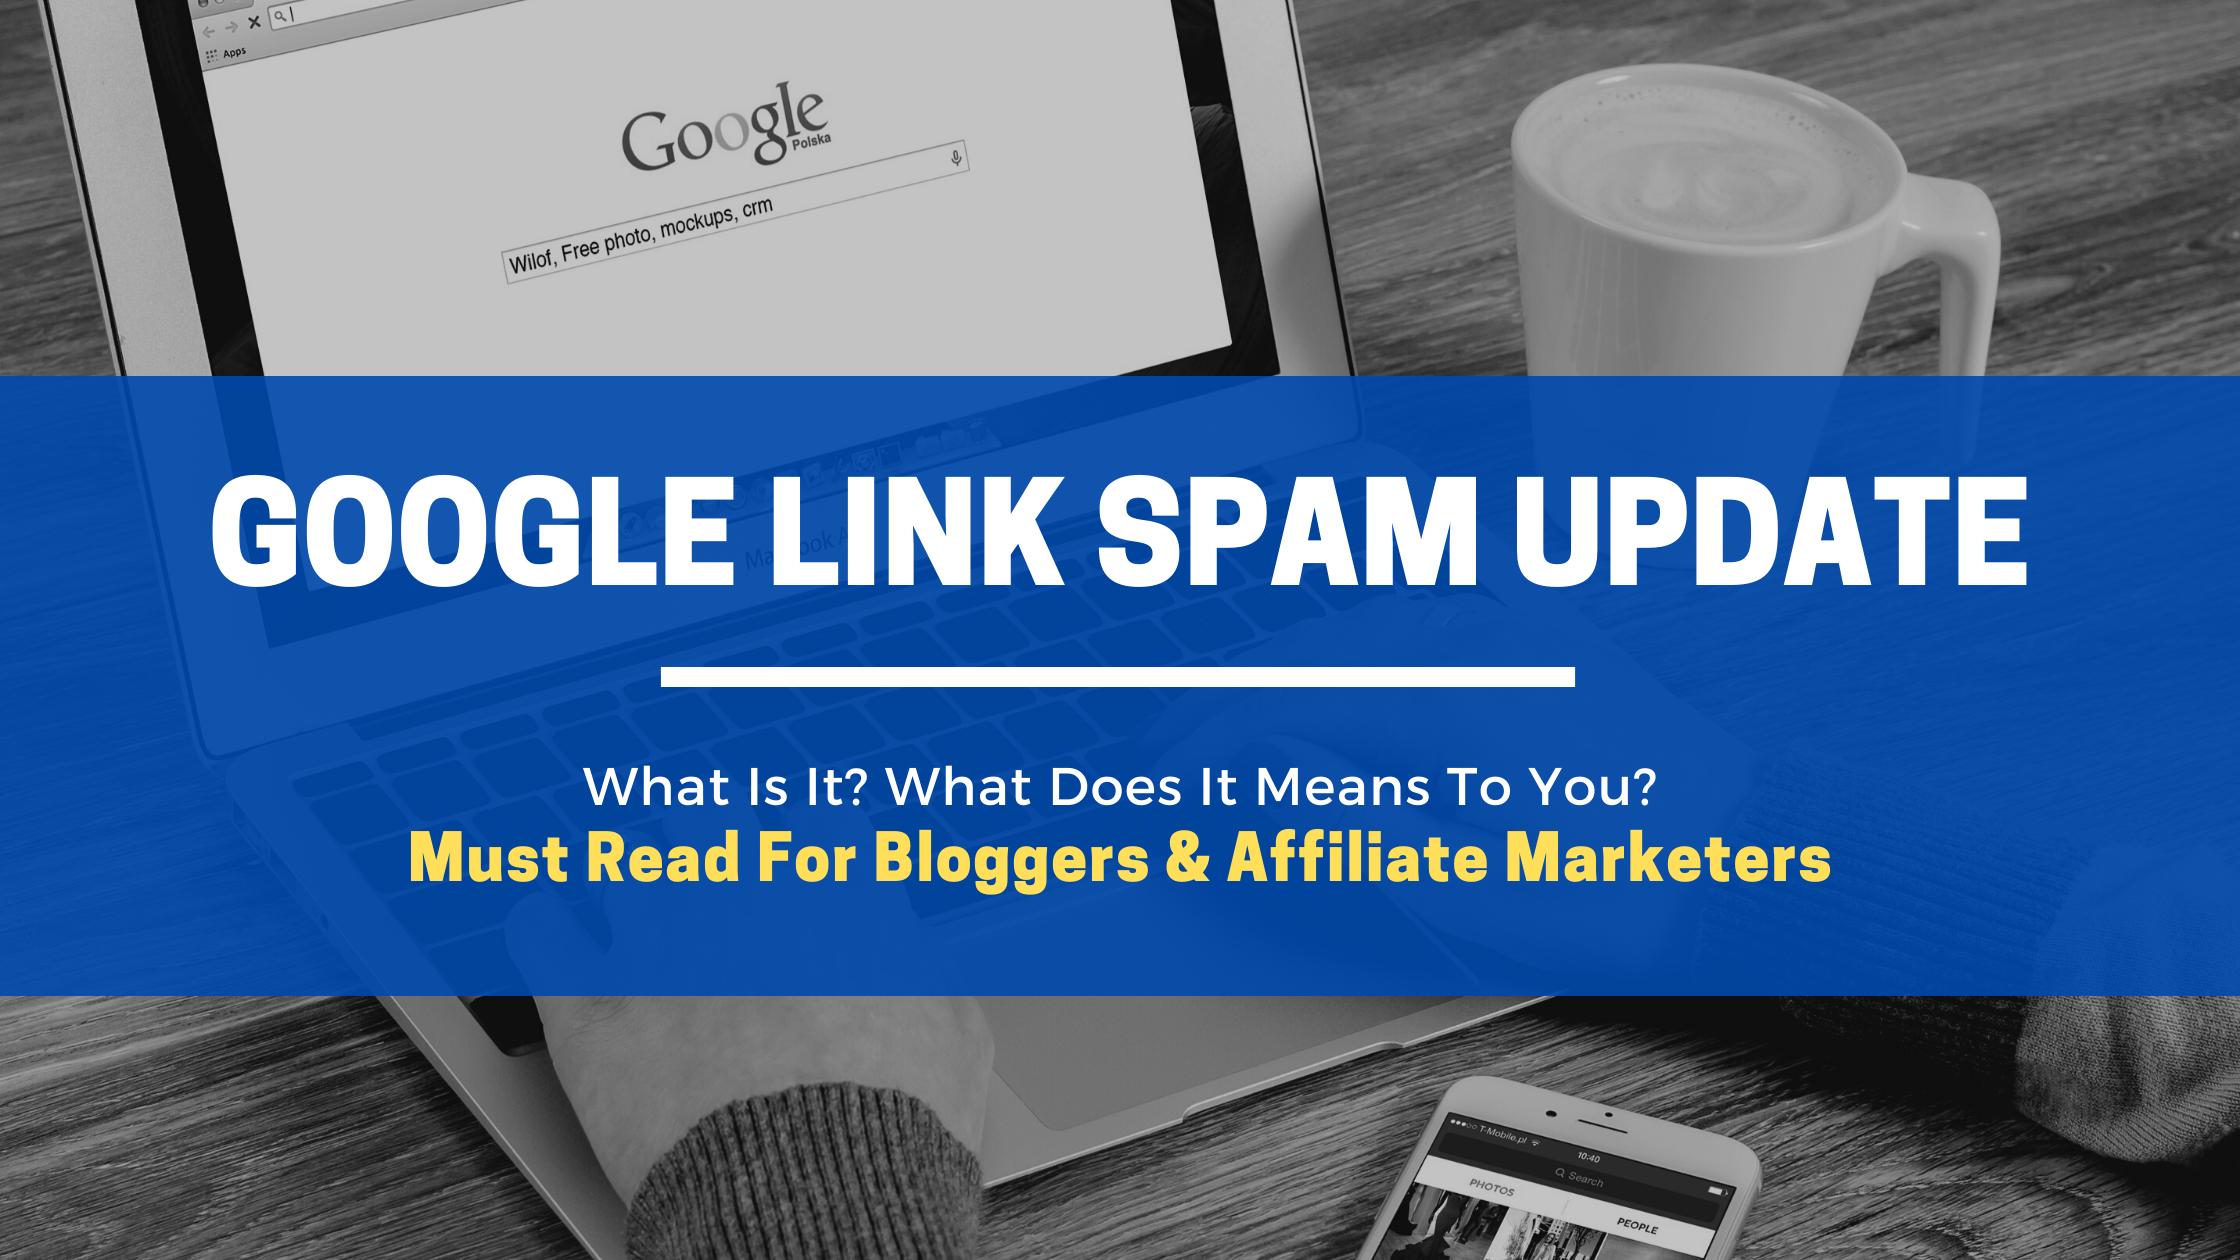 Google Link Spam Update